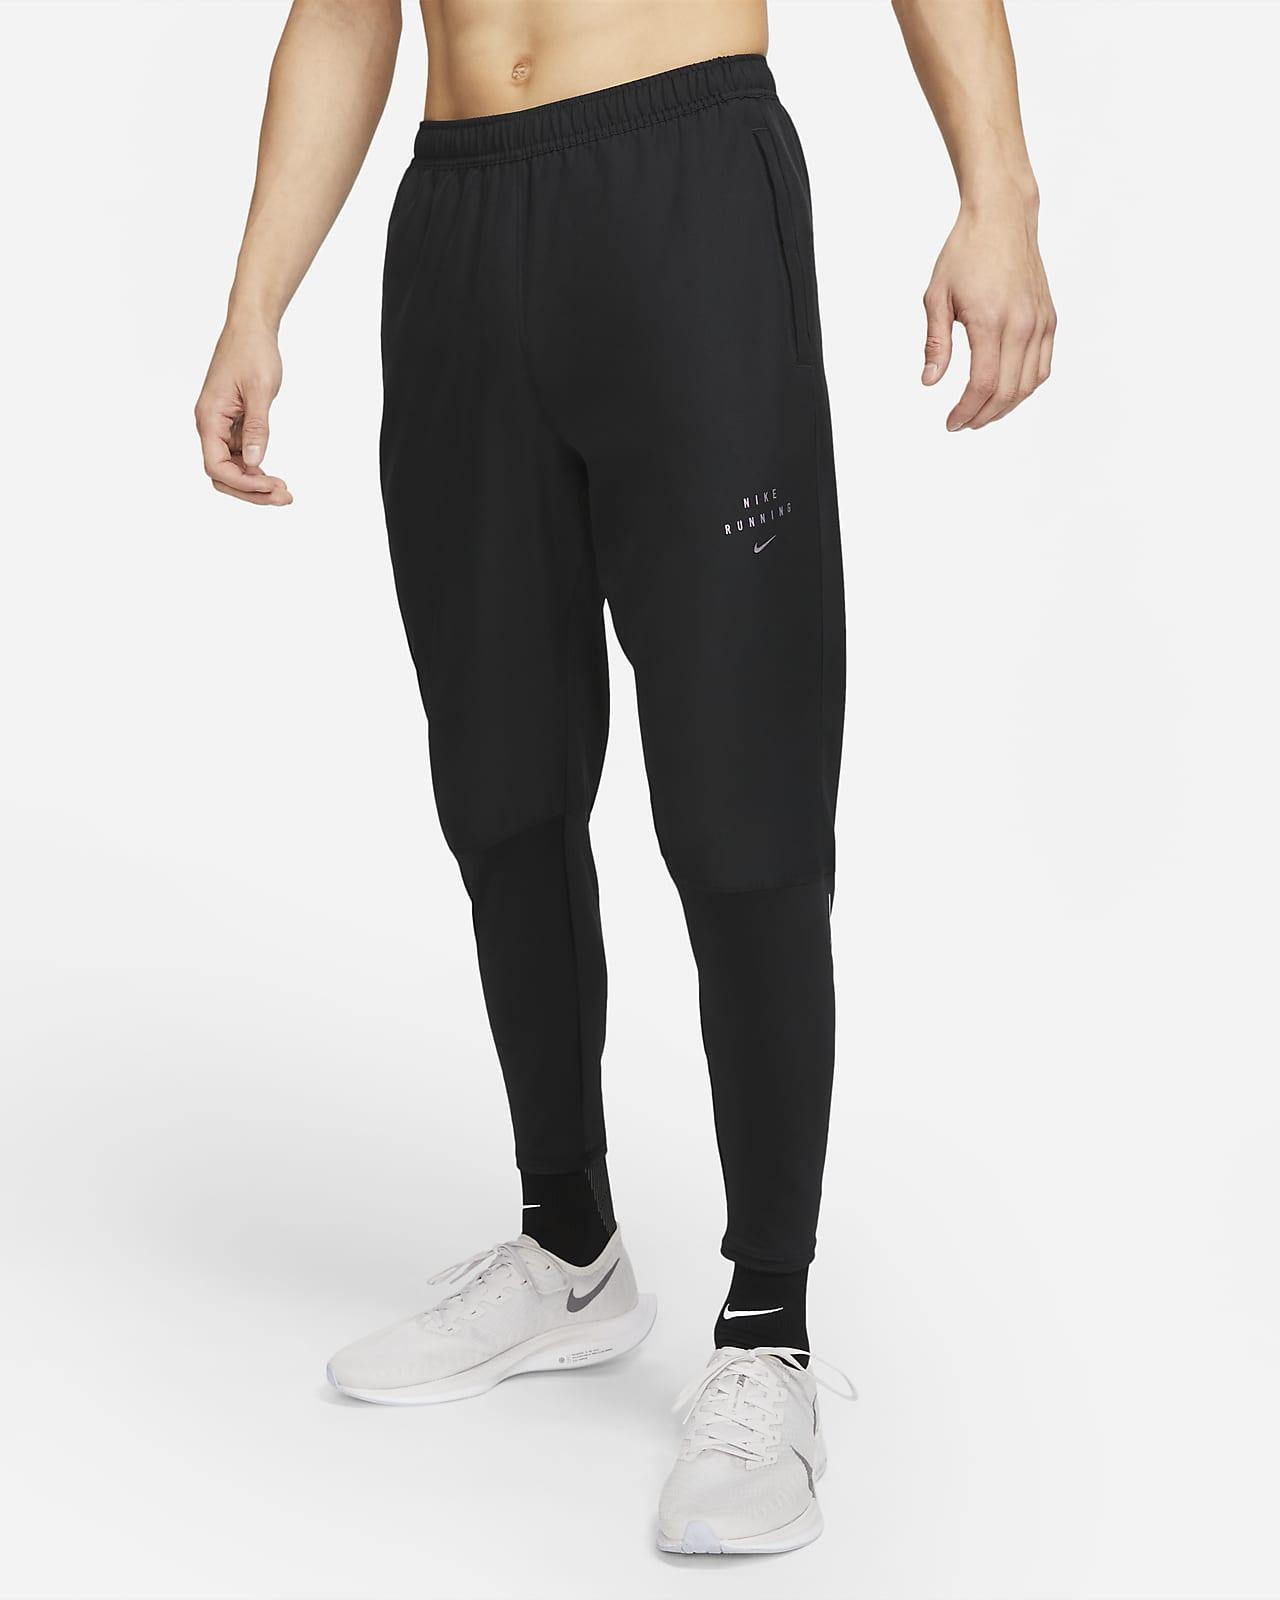 Nike Essential Run Division Men's Hybrid Running Trousers